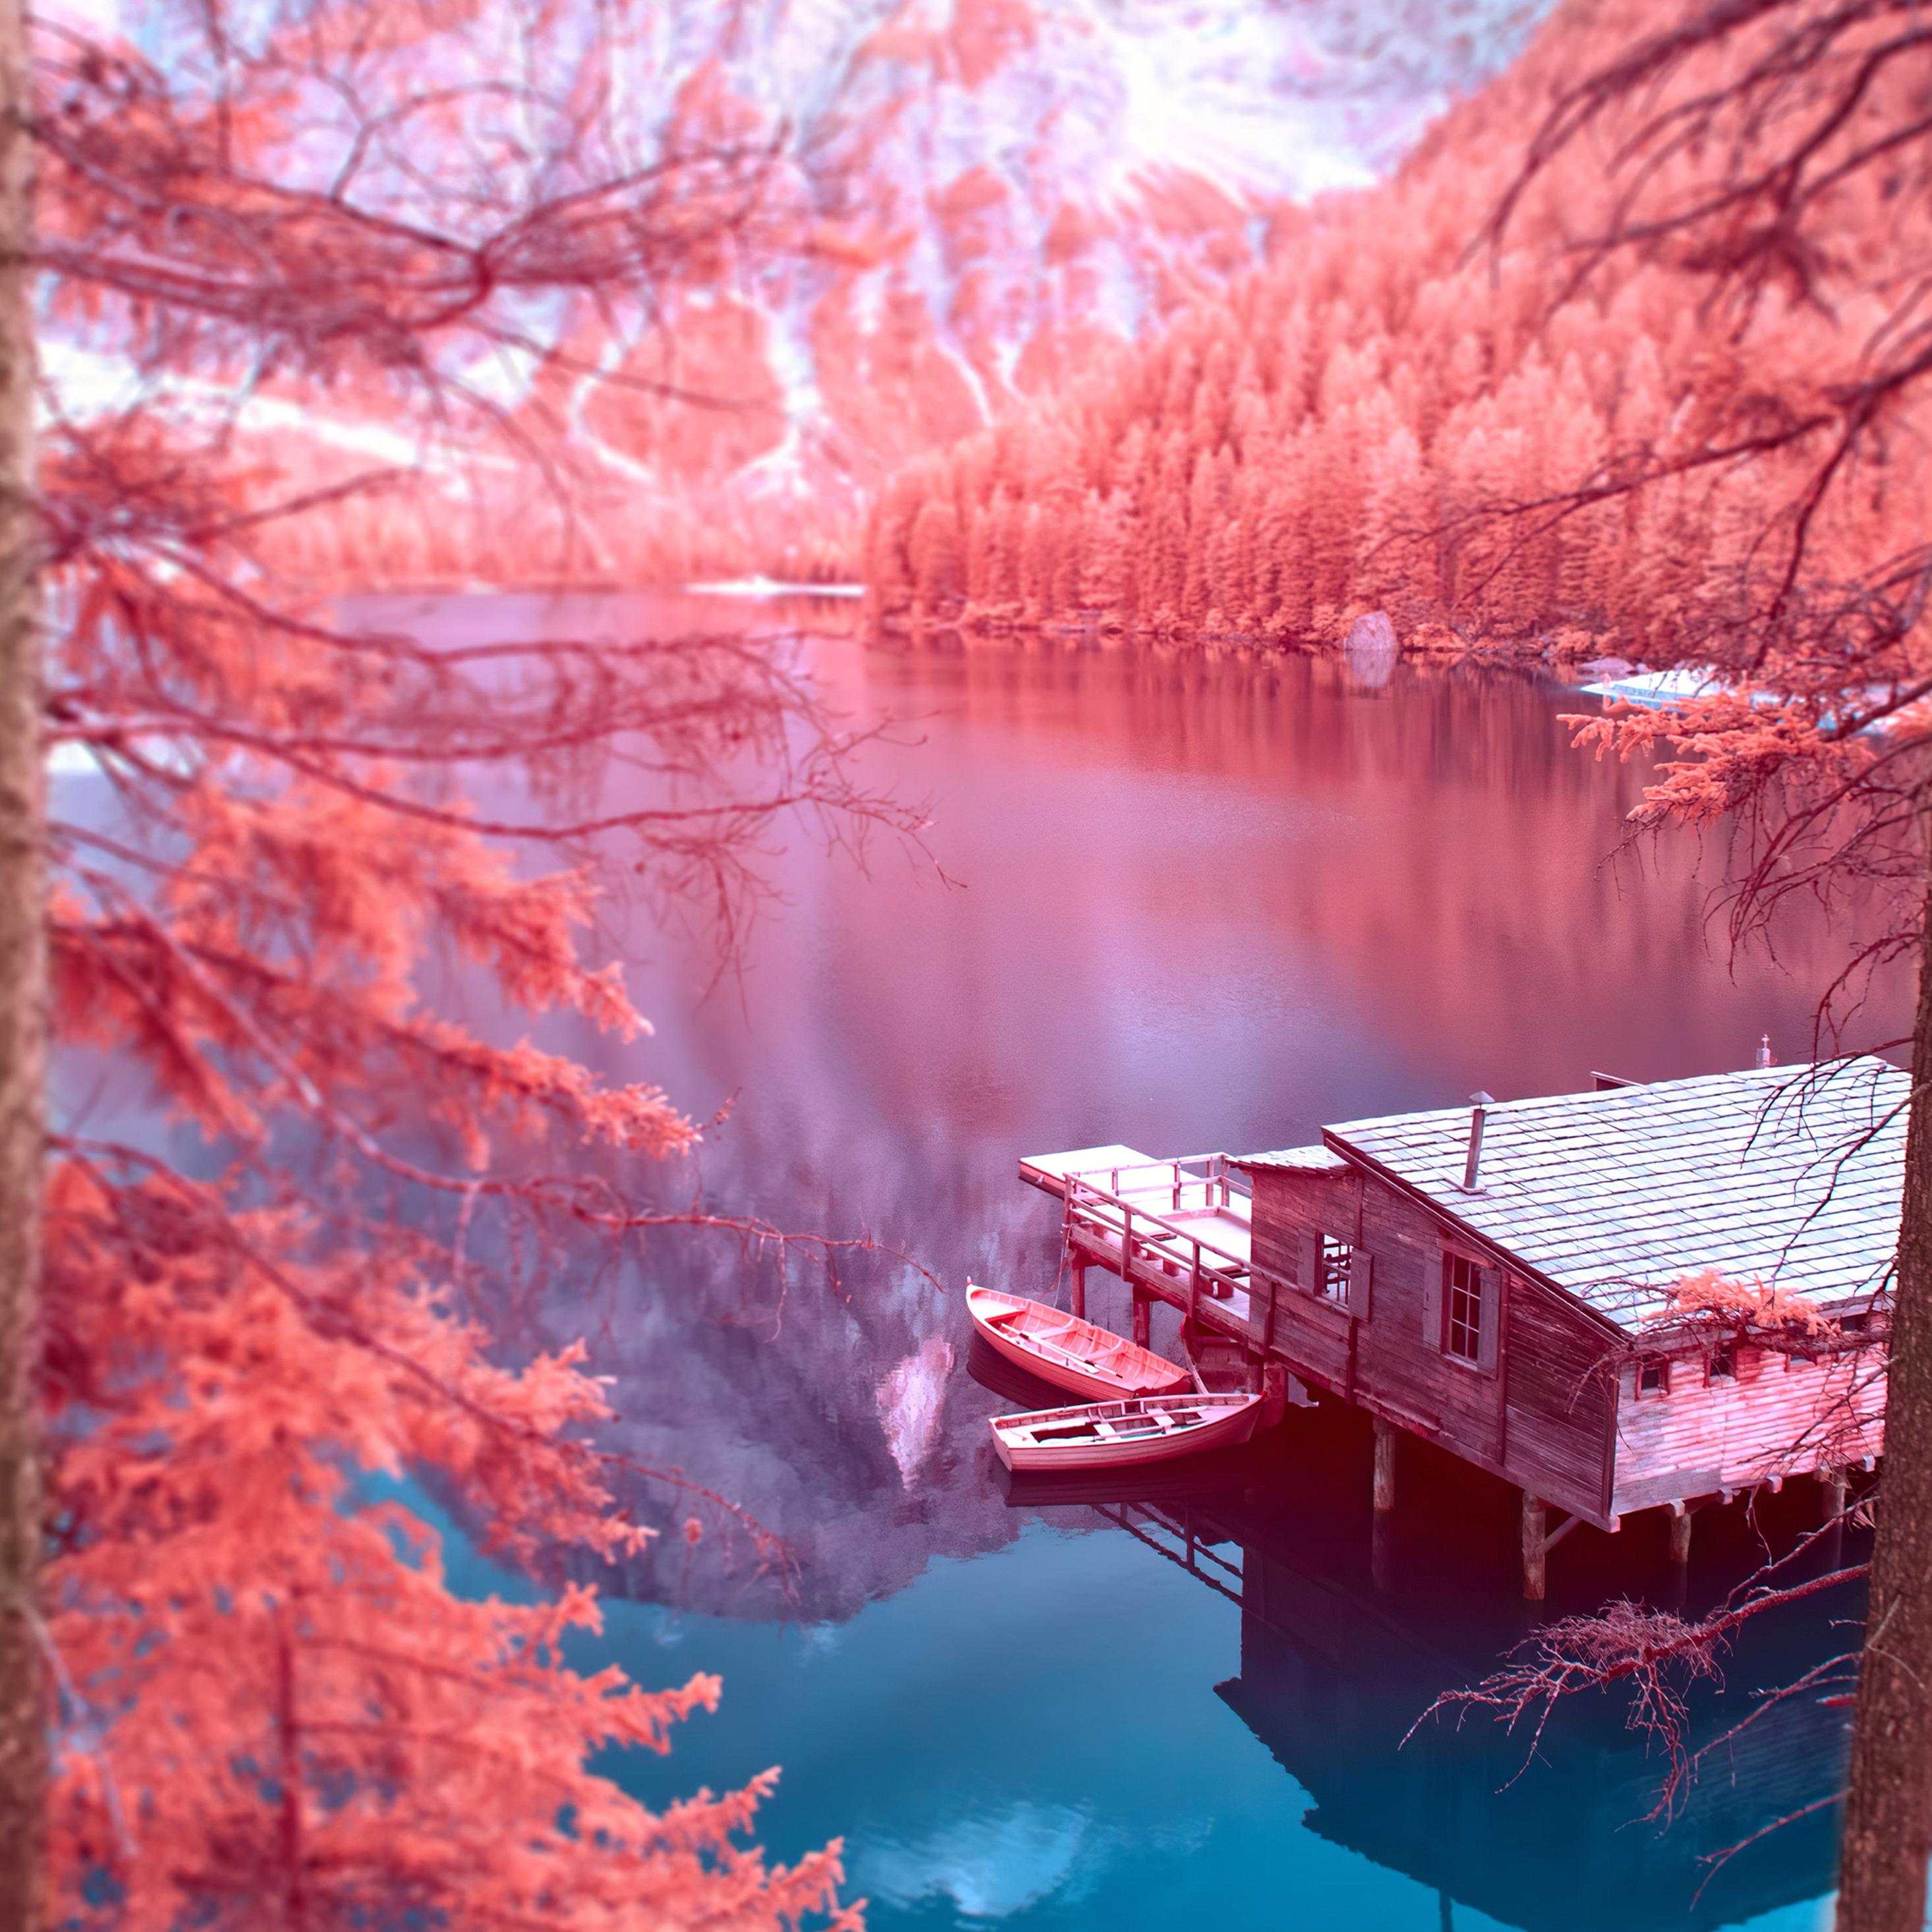 autumn-nature-4k-vn.jpg